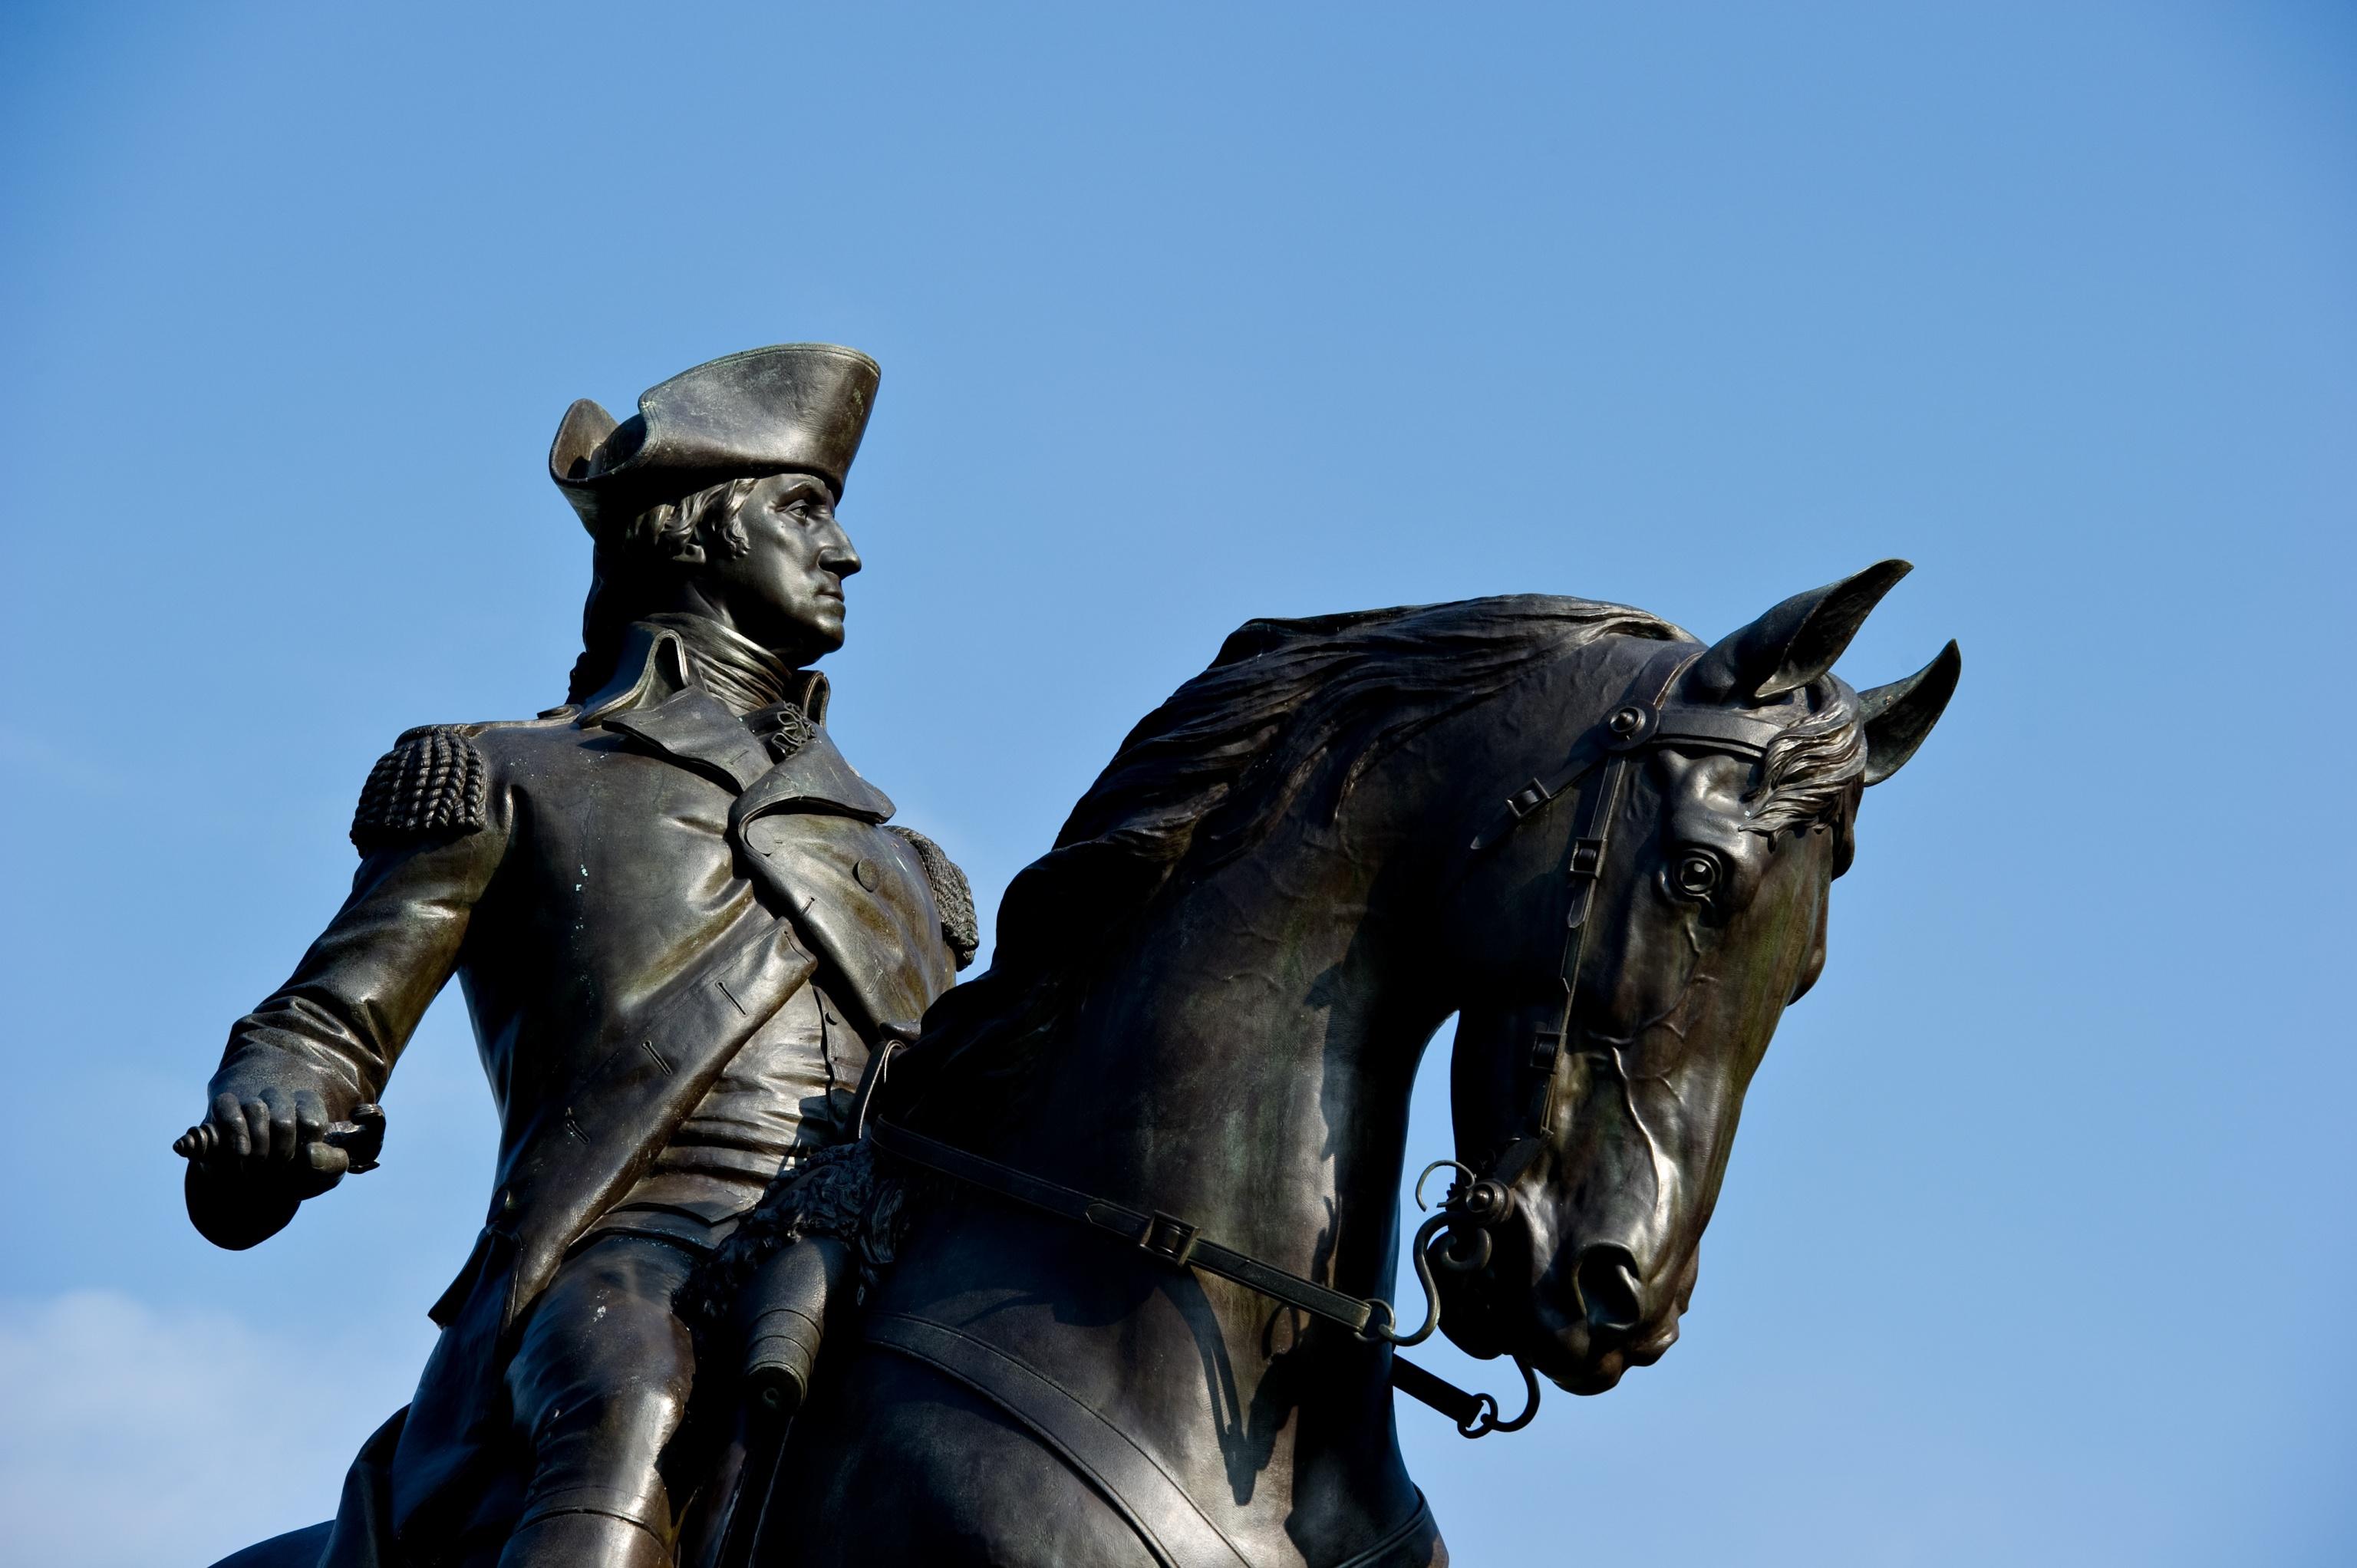 bigstock-Close-Up-Of-George-Washington--28521845.jpg